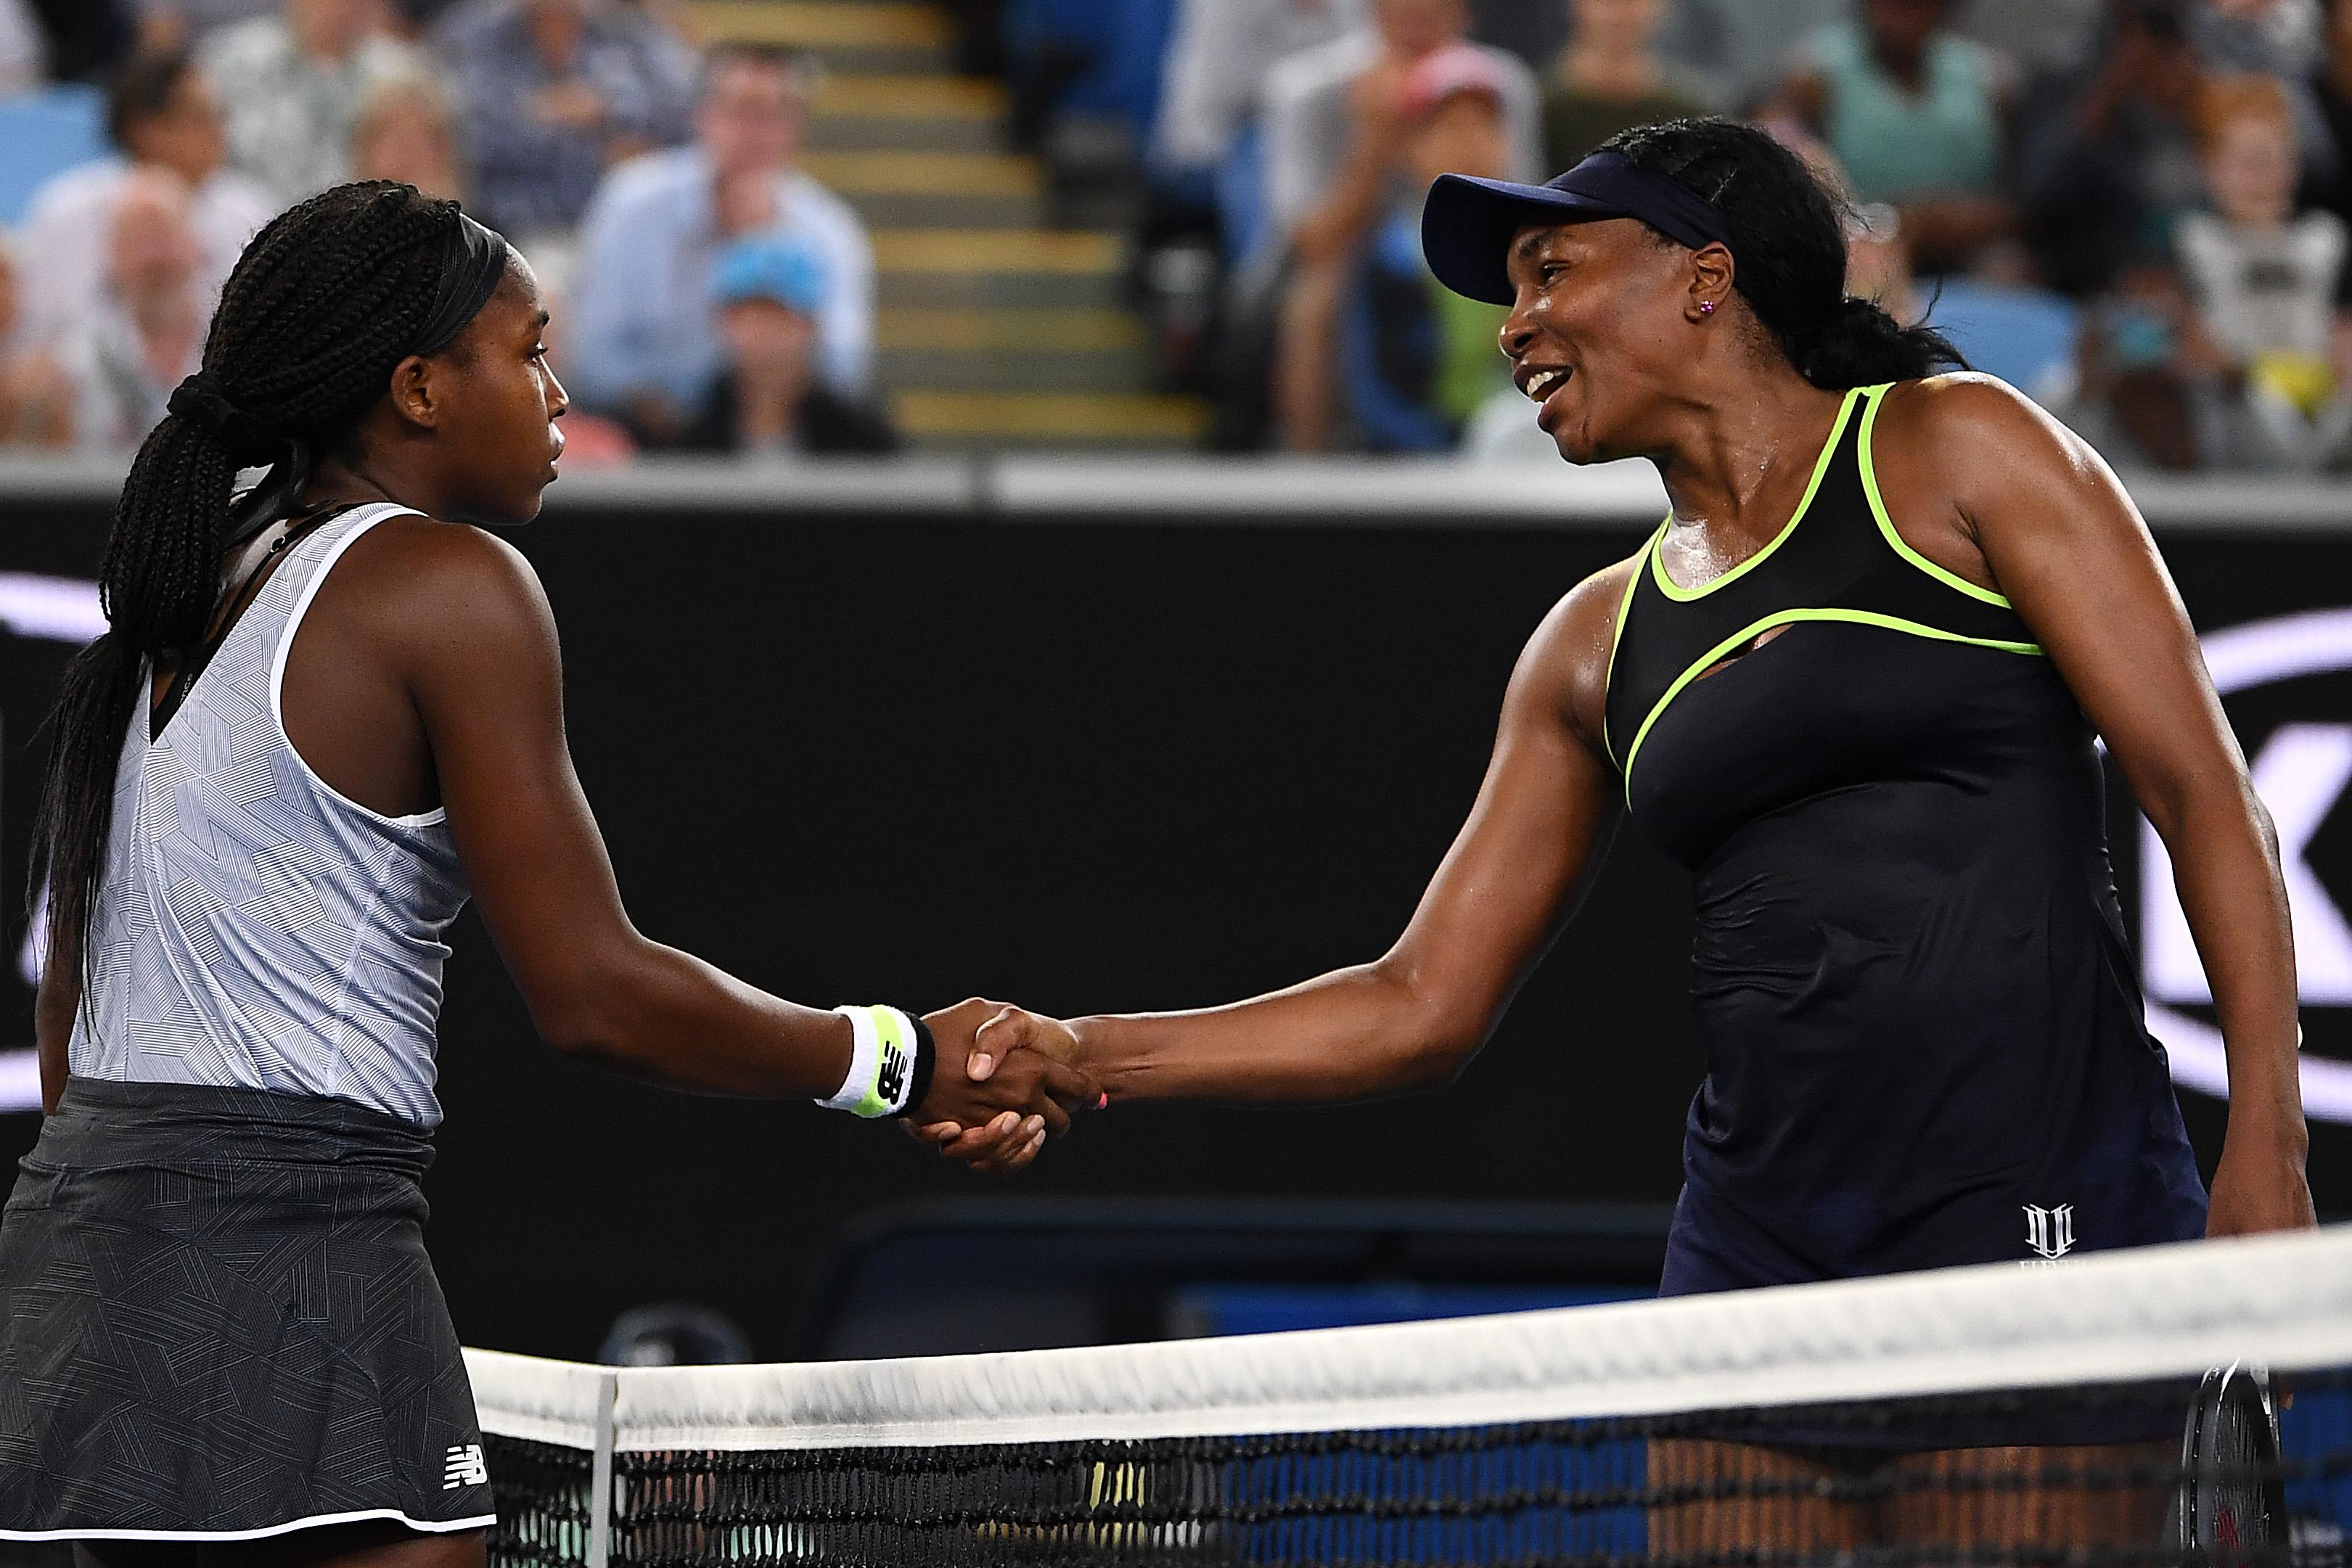 Coco Gauff defeats Venus Williams at Australian Open as Federer, Osaka and Serena also win